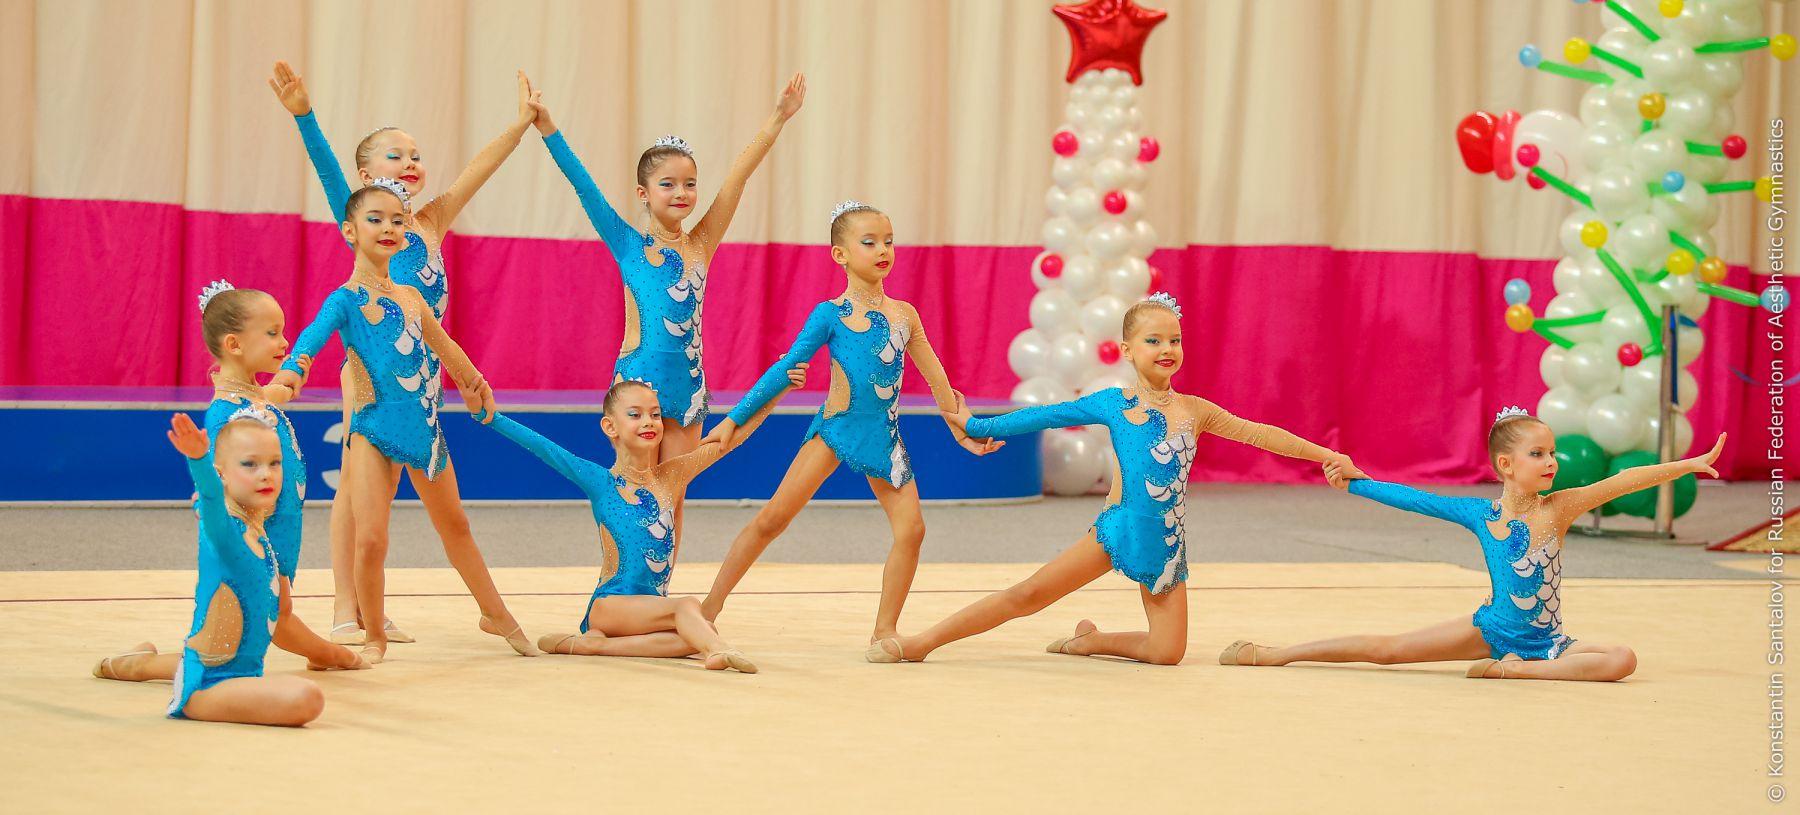 Гимнастика дети 6 лет фото